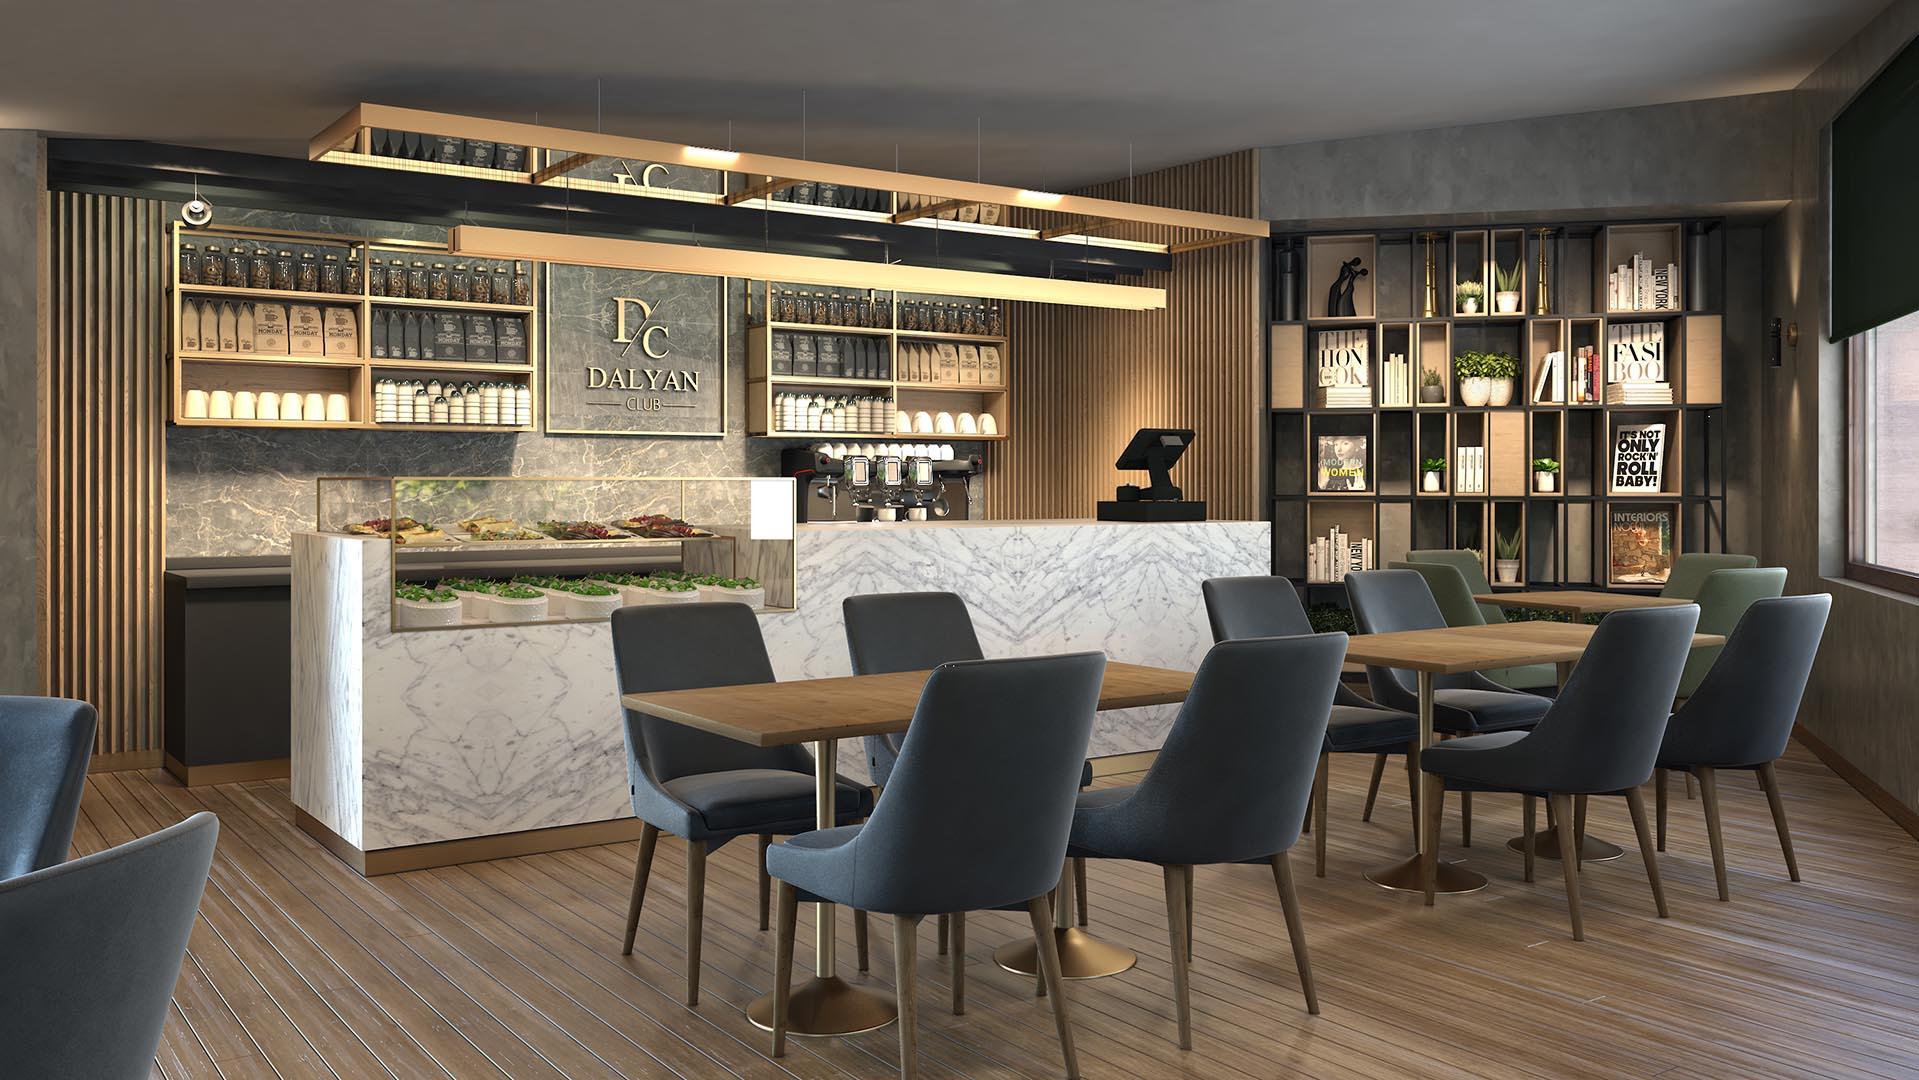 Dalyan Club Cafe